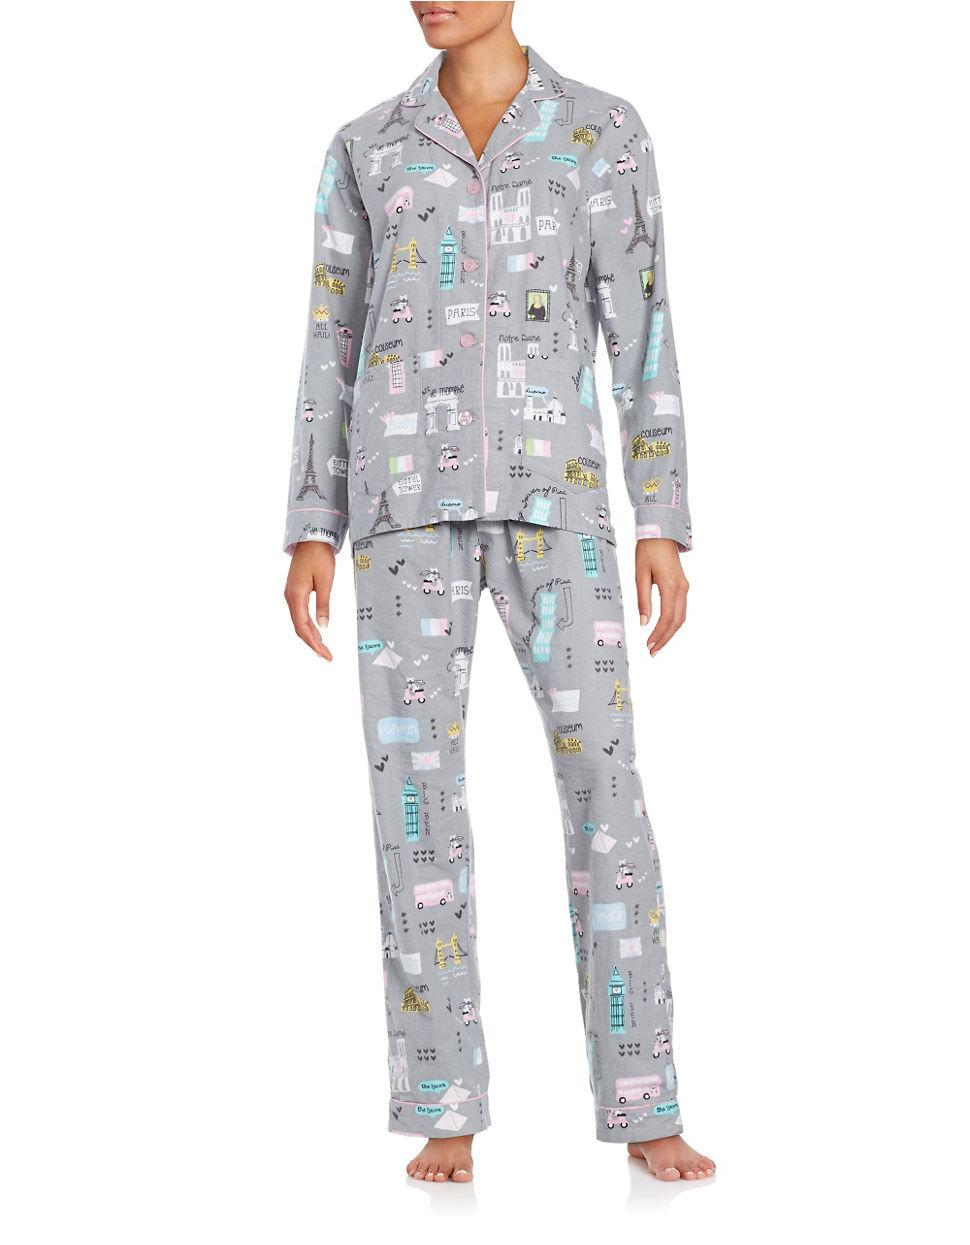 Pj salvage Travel Print Top And Pants Pajama Set in Gray ...